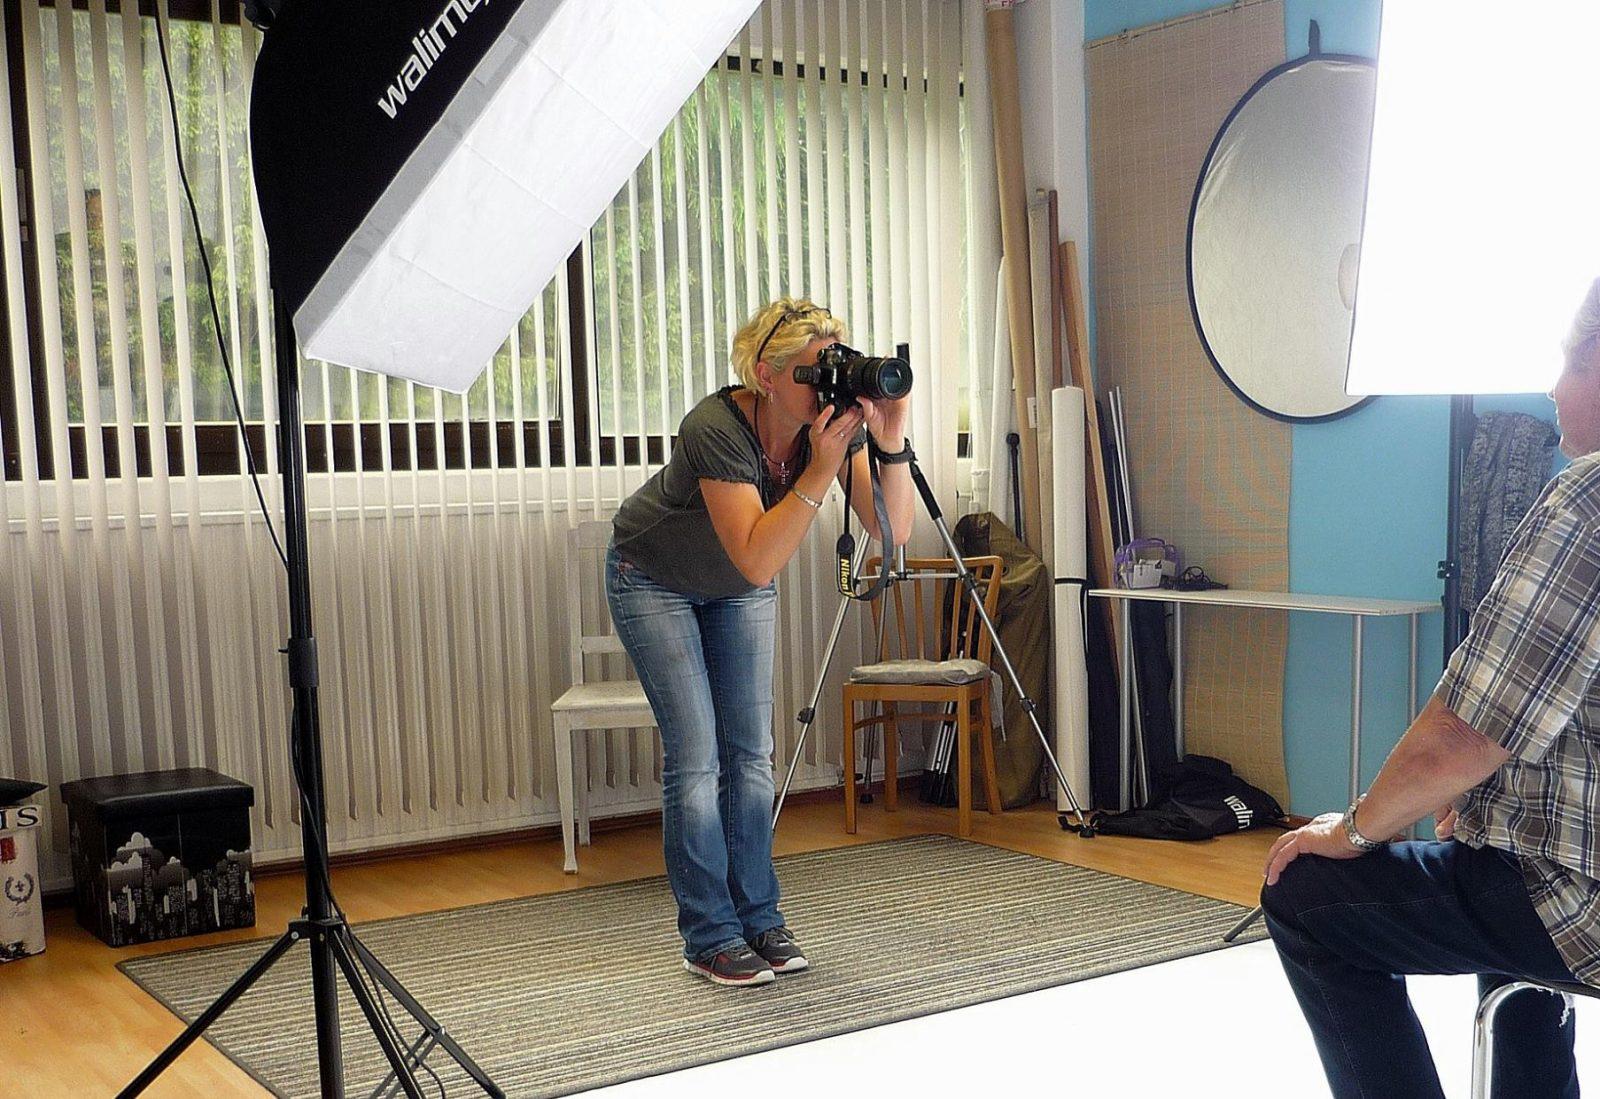 Fotostudio Web Design Stube Fotografin Simone Werner-Ney